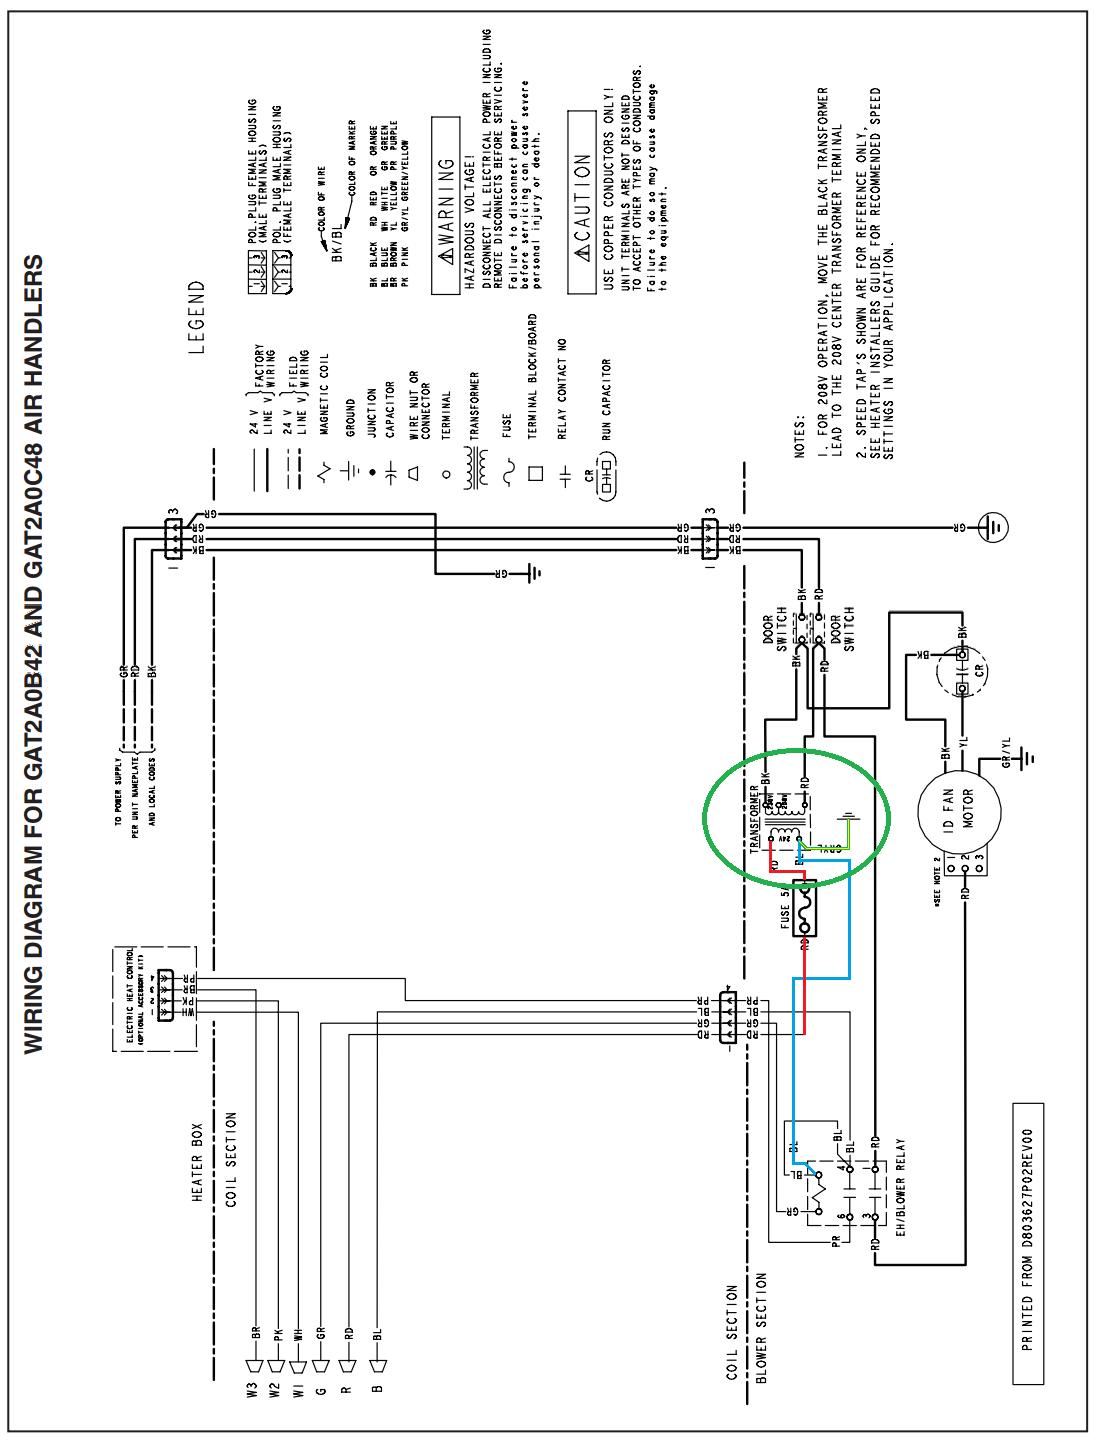 Trane 2twb3048a1000aa Wiring Diagram